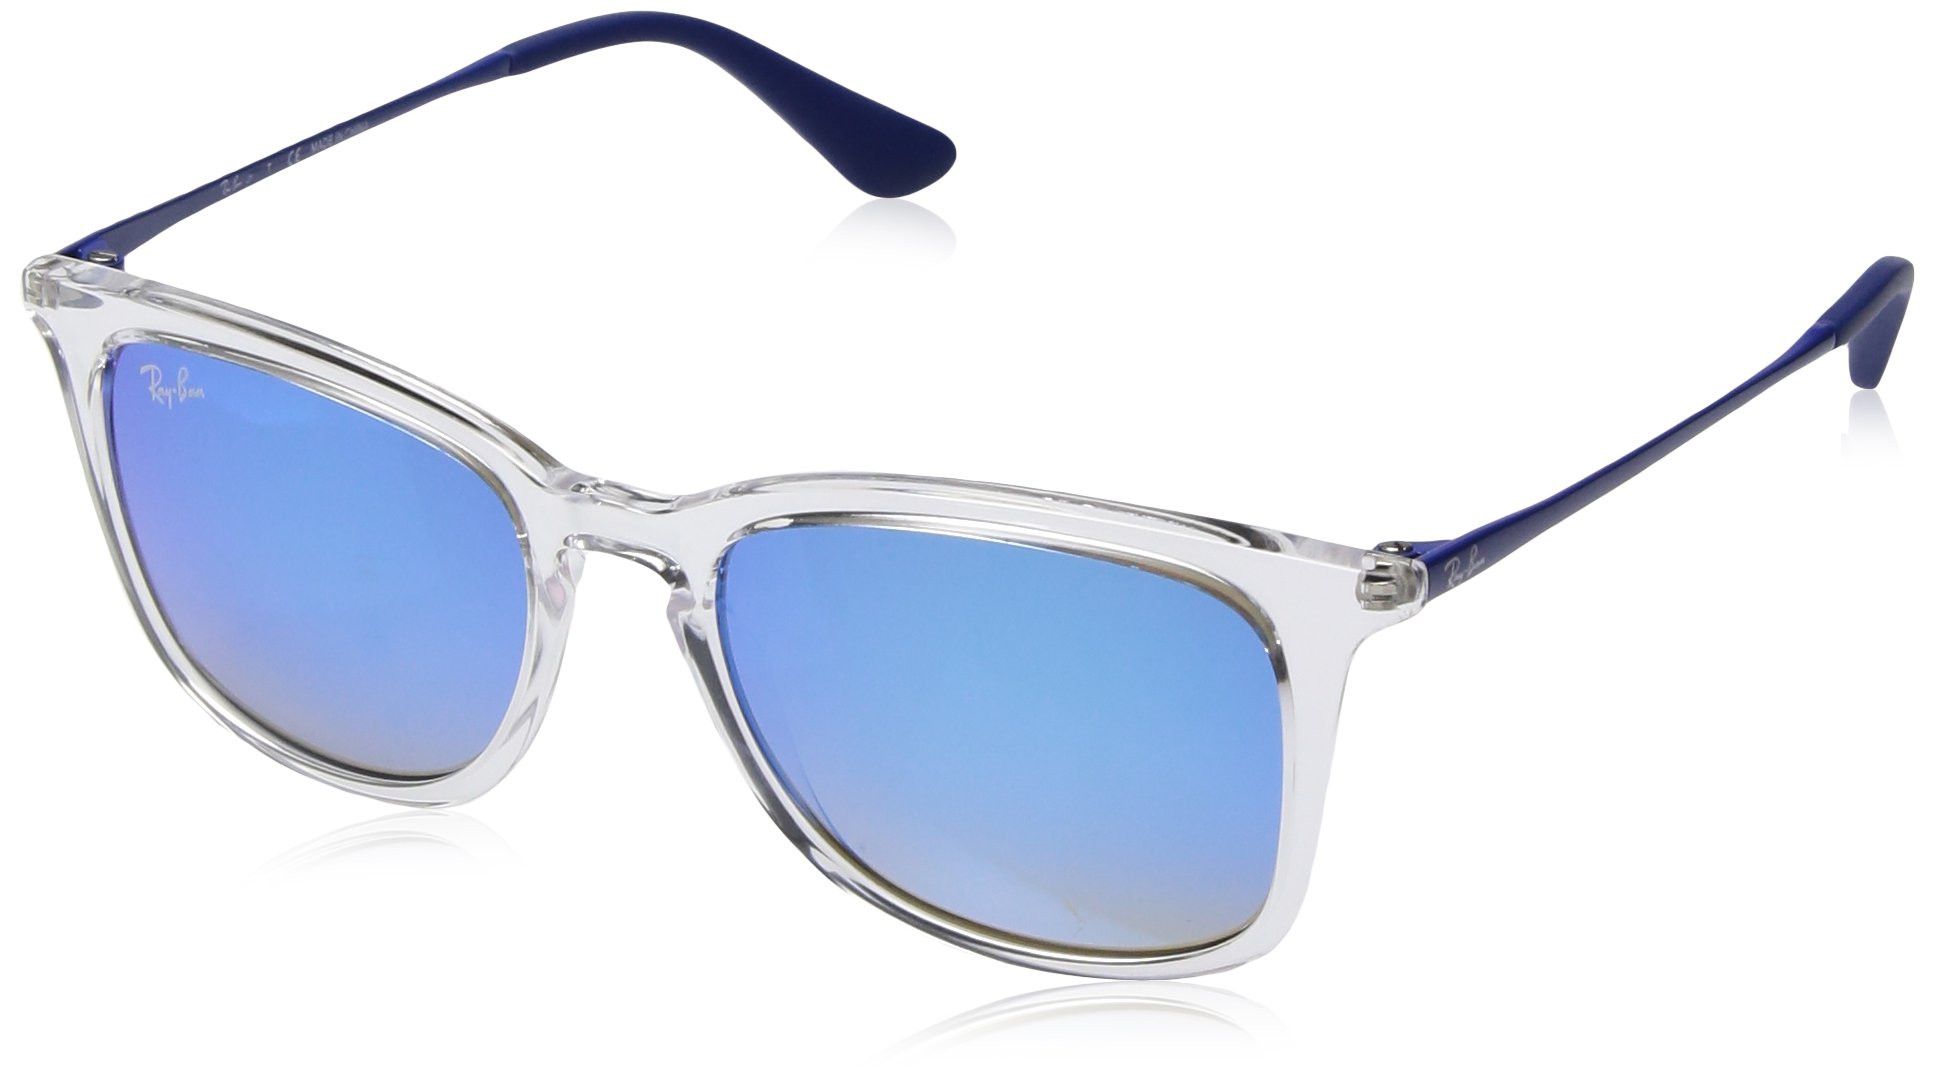 Ray-Ban Junior RJ9063S Square Kids Sunglasses, Transparent/Blue Gradient Flash, 48 mm